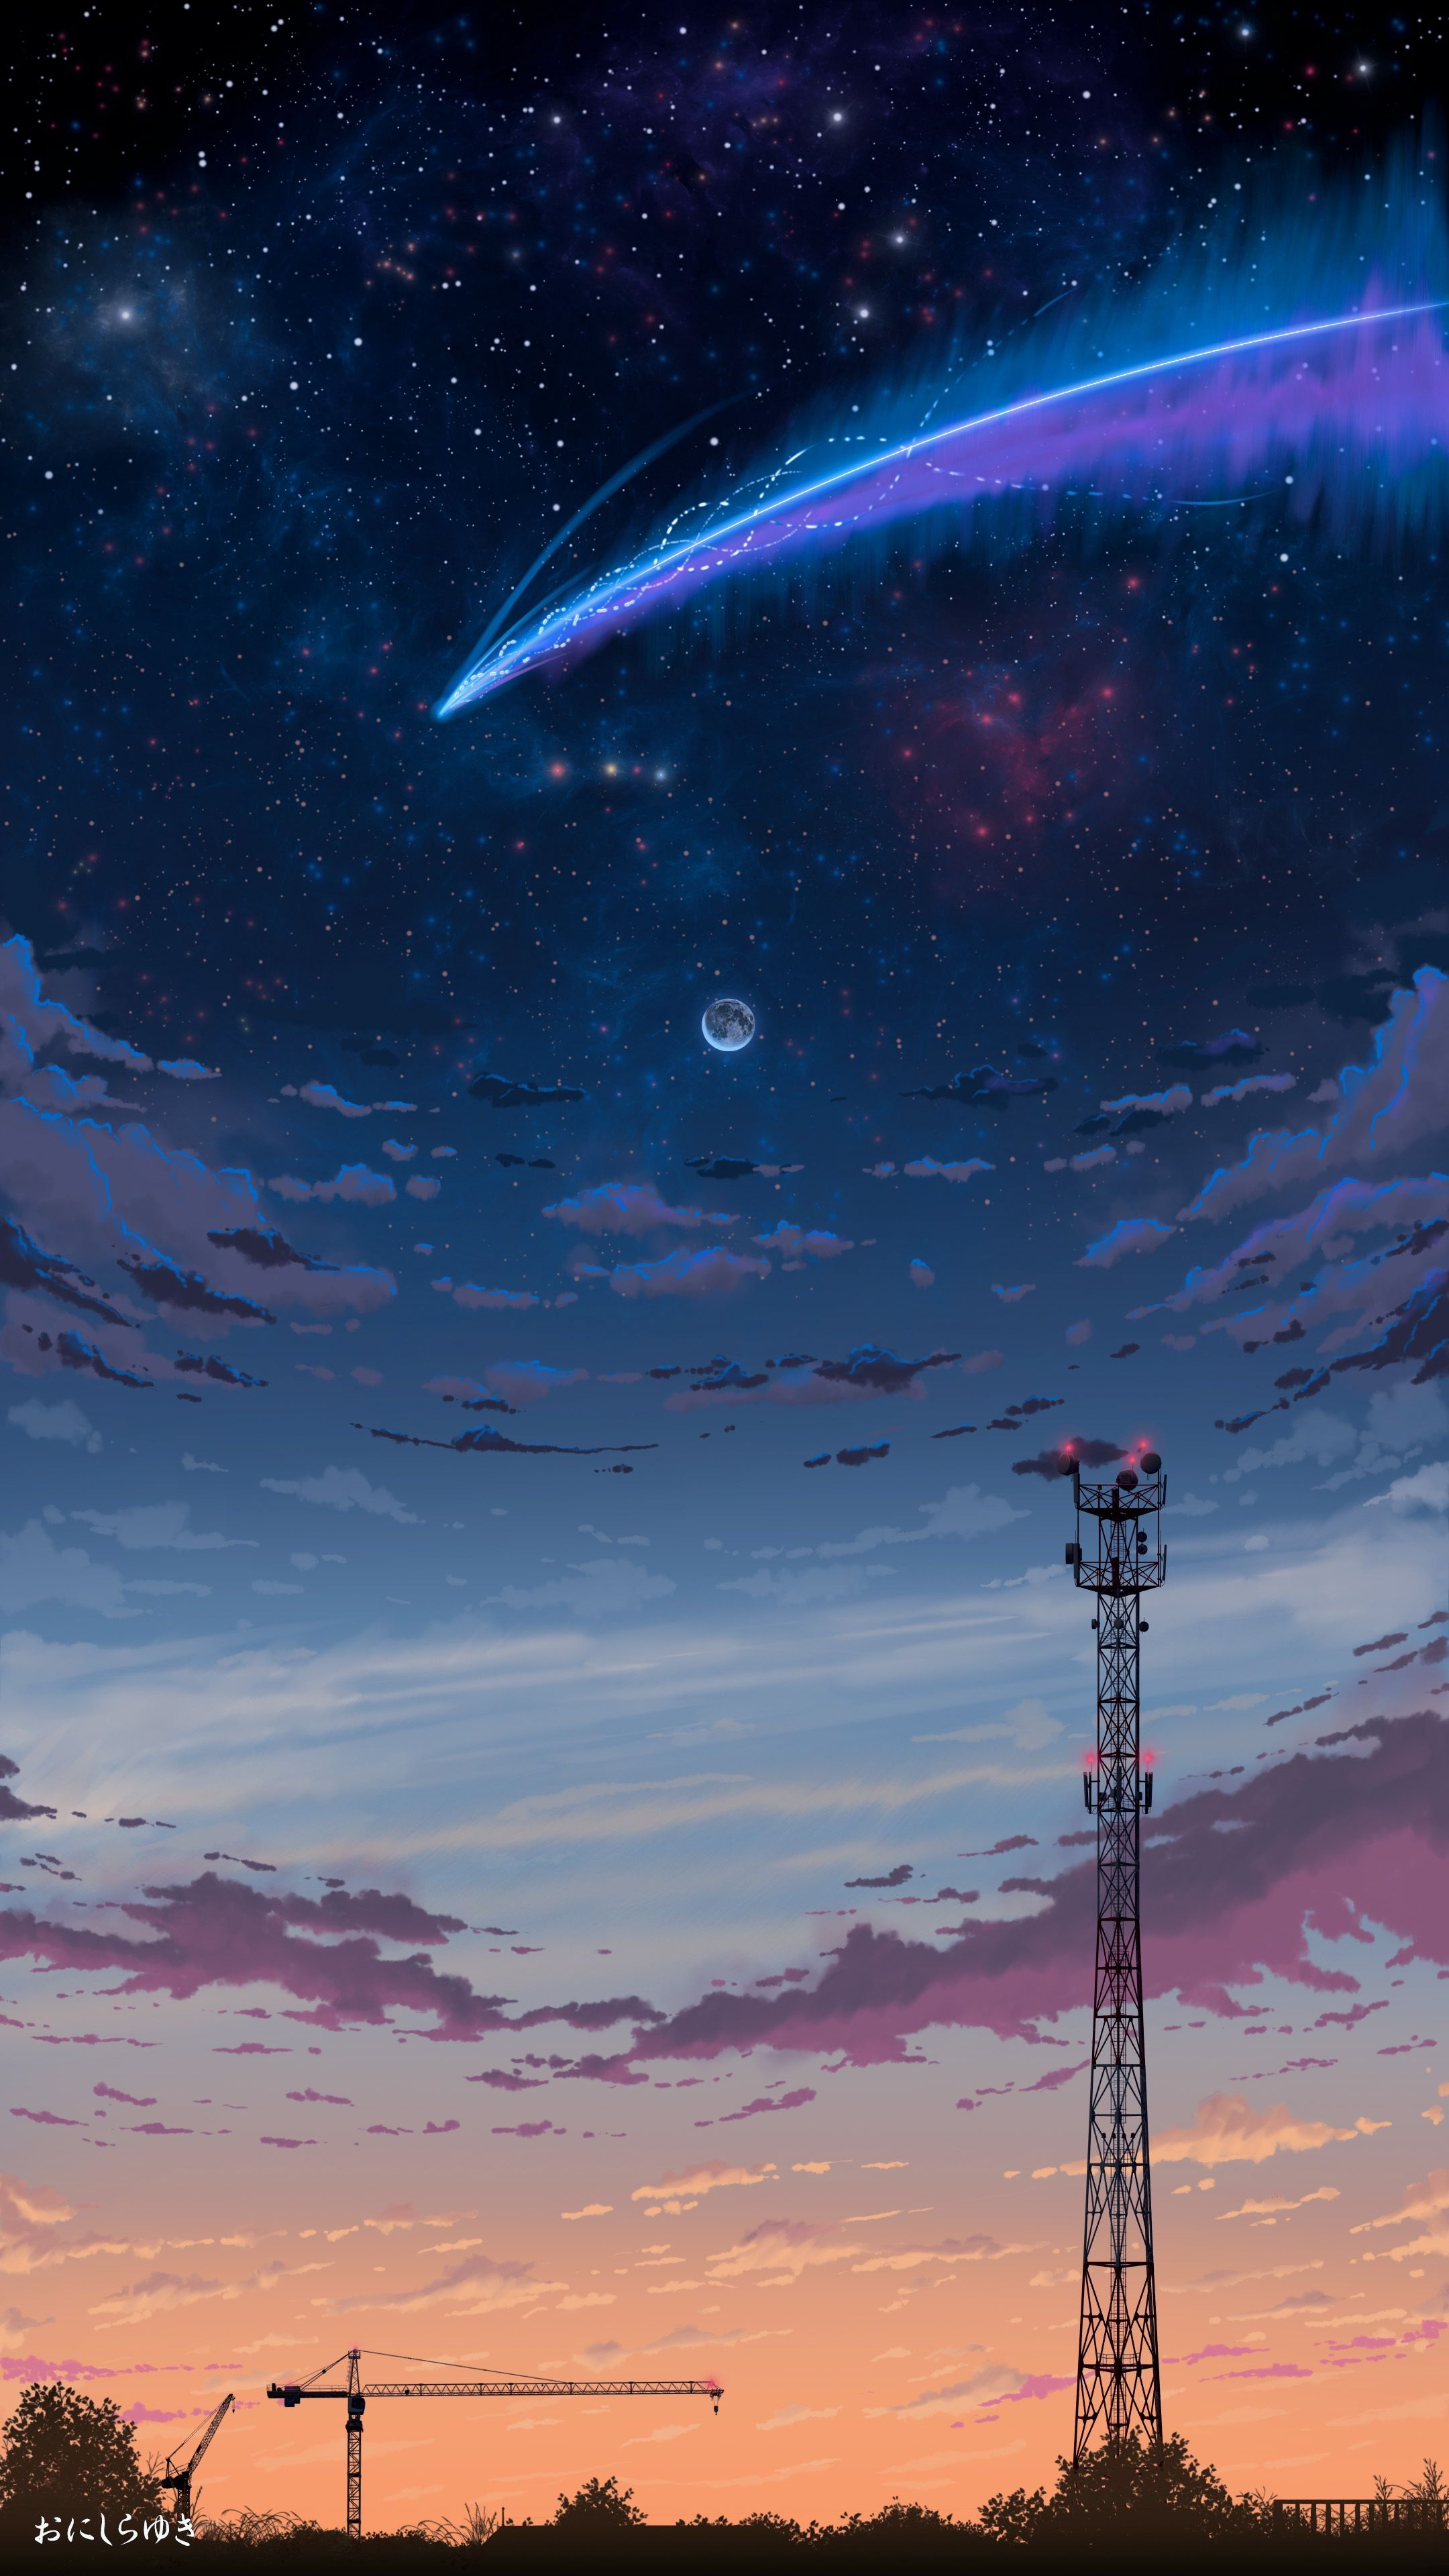 Hd Oboi Hd Wallpaper Scenery Wallpaper Anime Scenery Anime Scenery Wallpaper Anime landscape wallpaper iphone